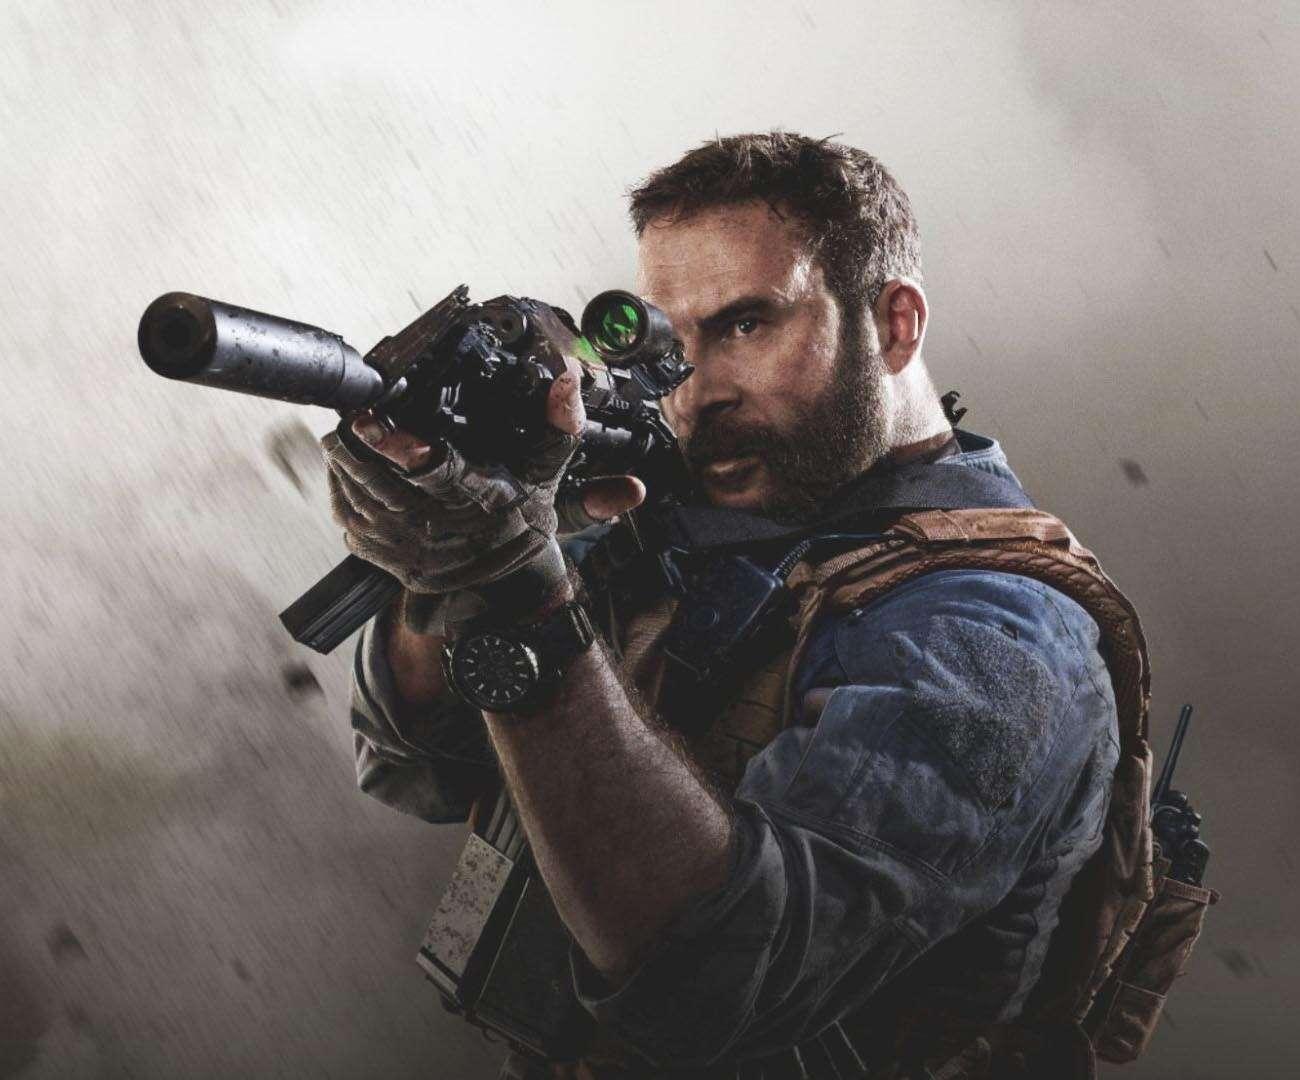 Remaster nowego Call of Duty Modern Warfare? Gra zauważona na PS5